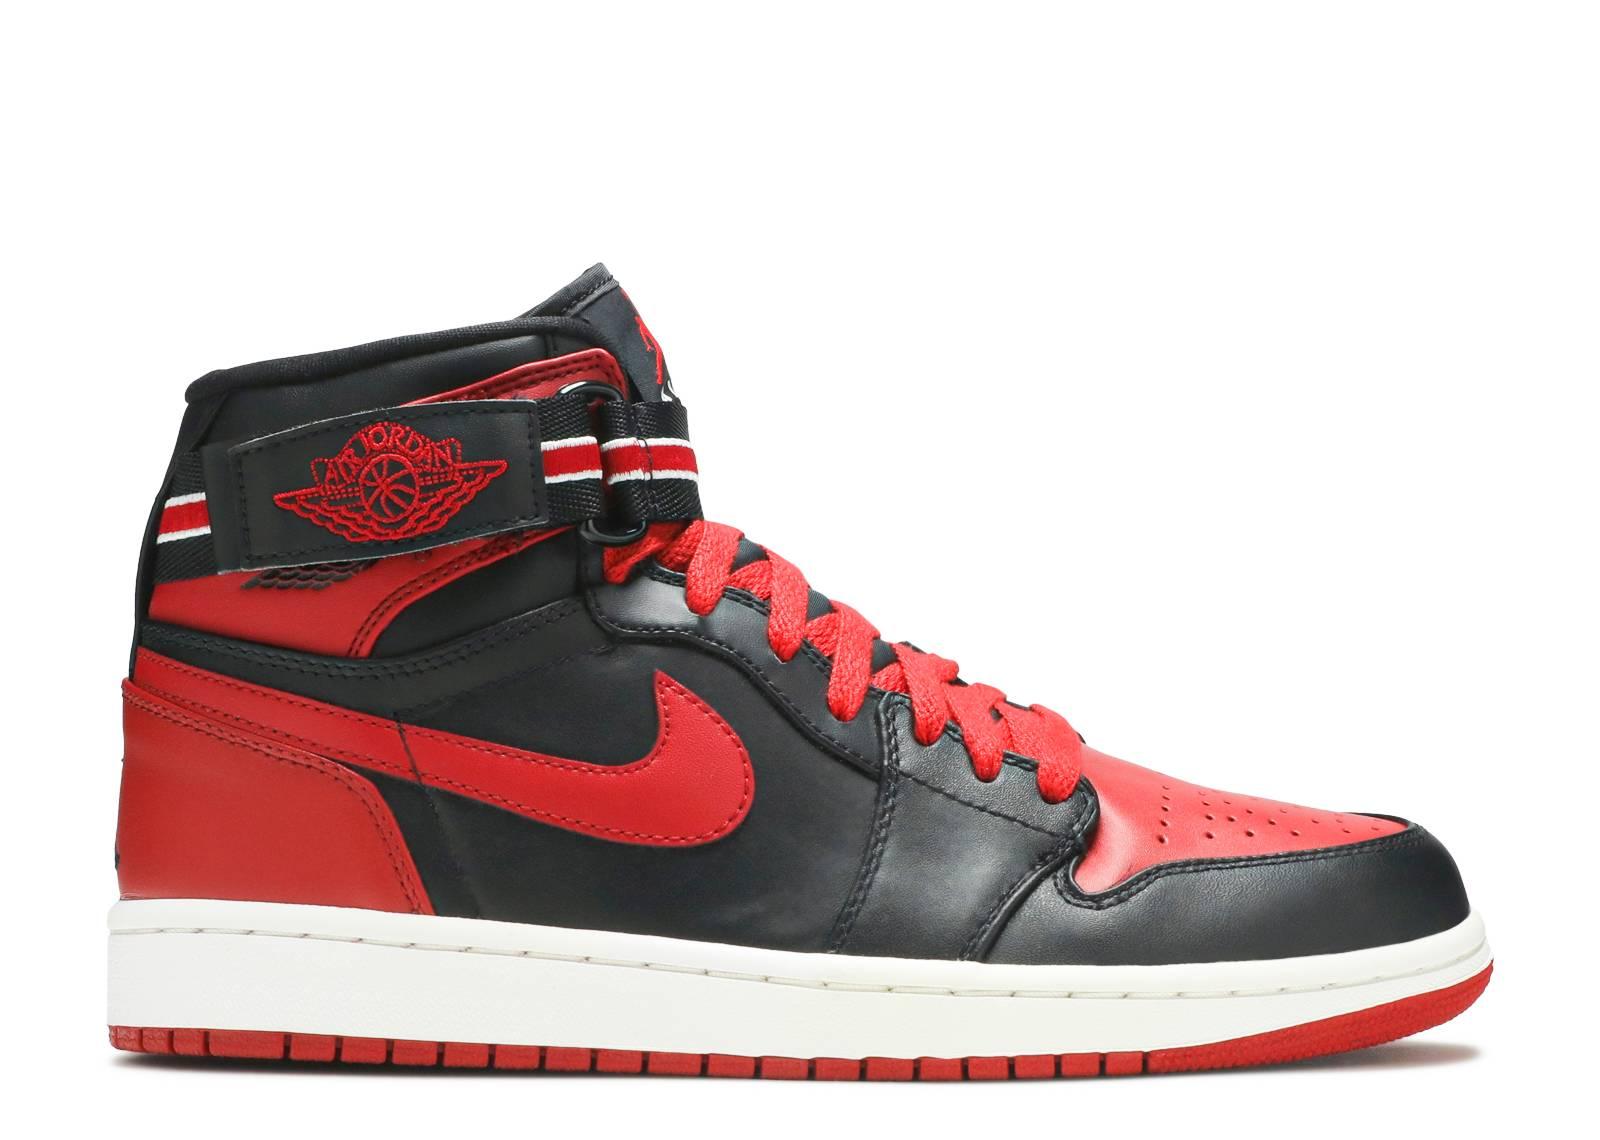 78ca4d1dad9 Air Jordan 1 High Strap